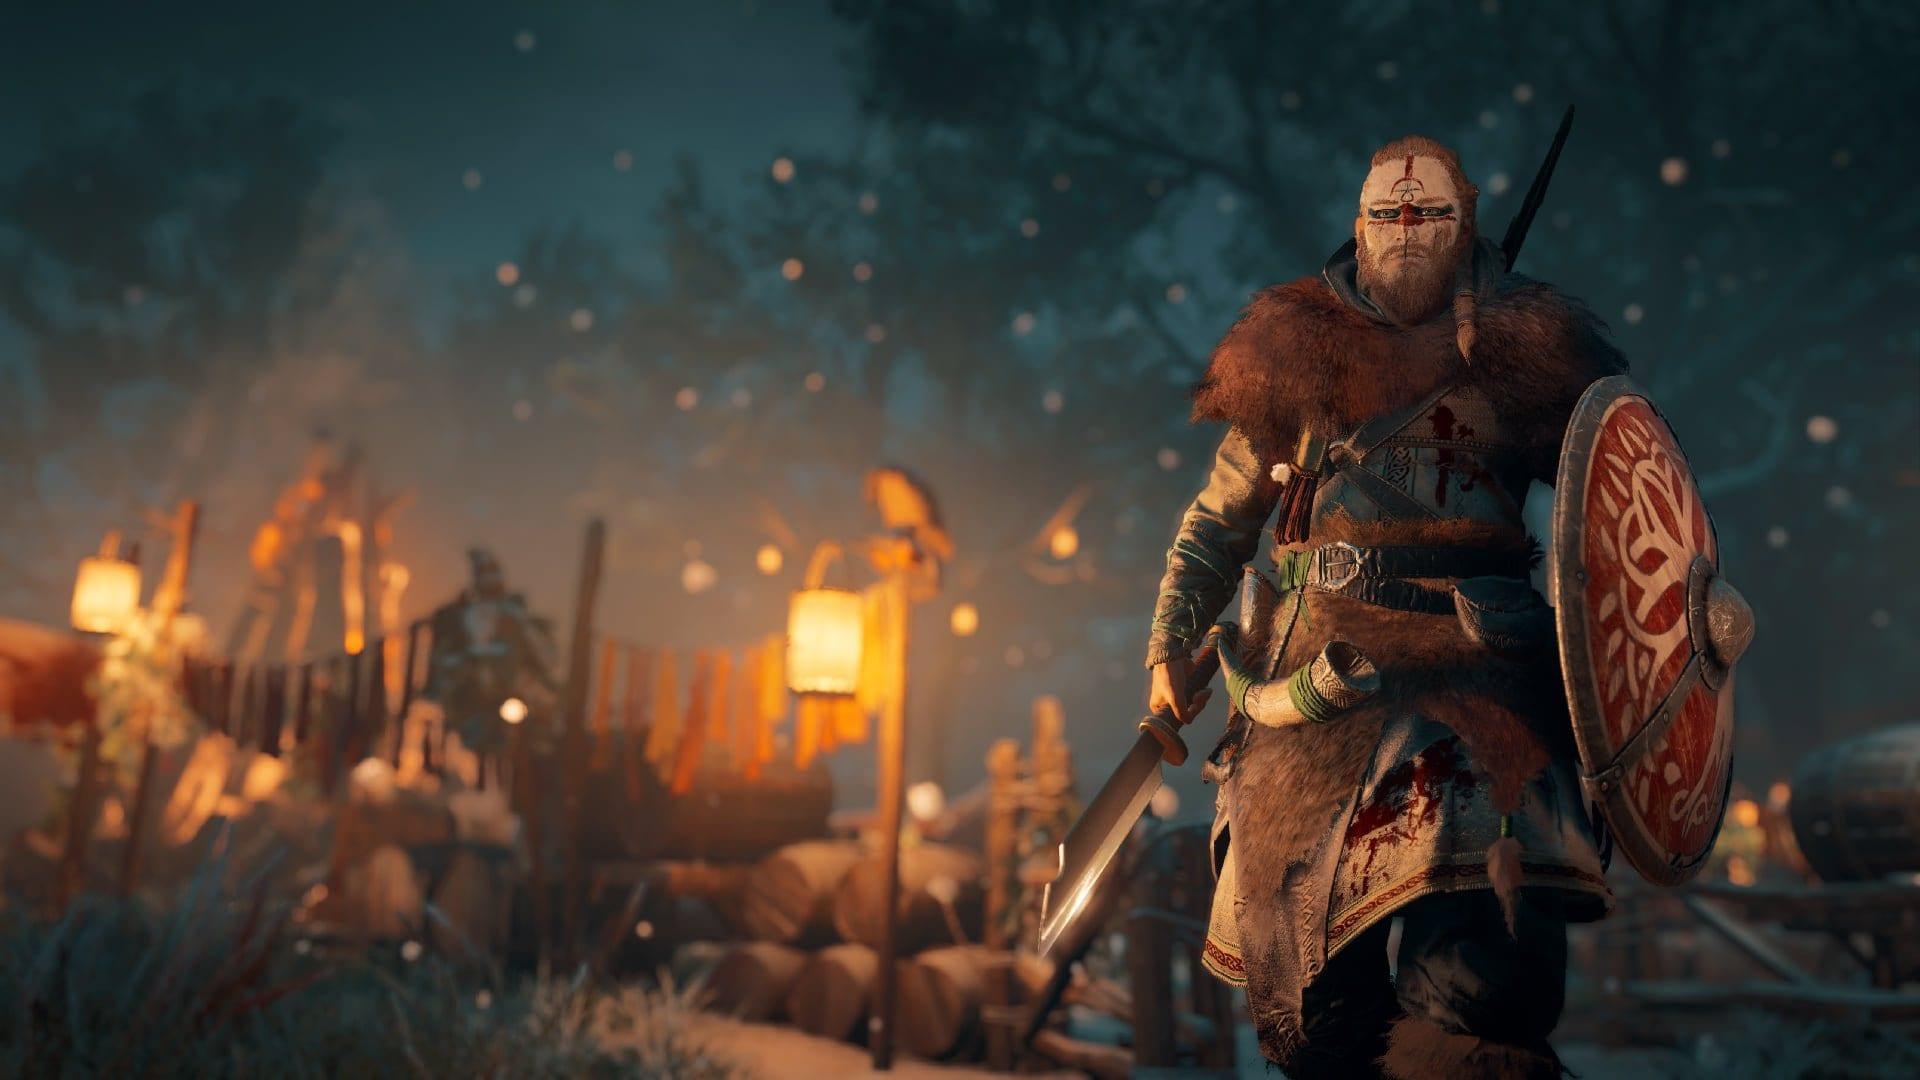 Assassin's Creed Valhalla Mōdraniht Julmarke